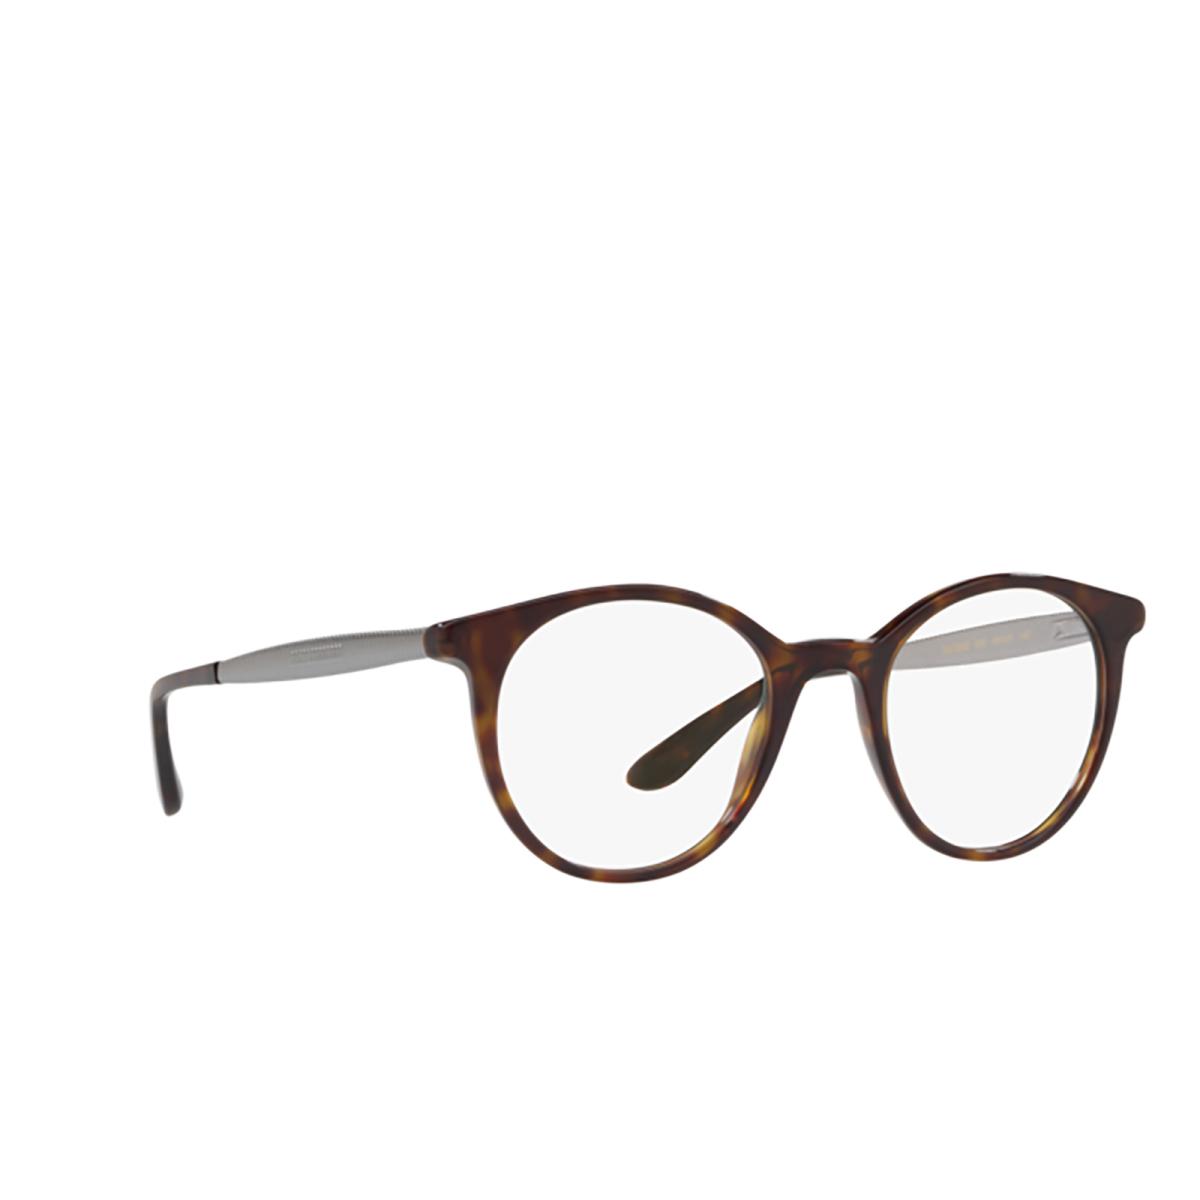 Dolce & Gabbana® Round Eyeglasses: DG3292 color 502.